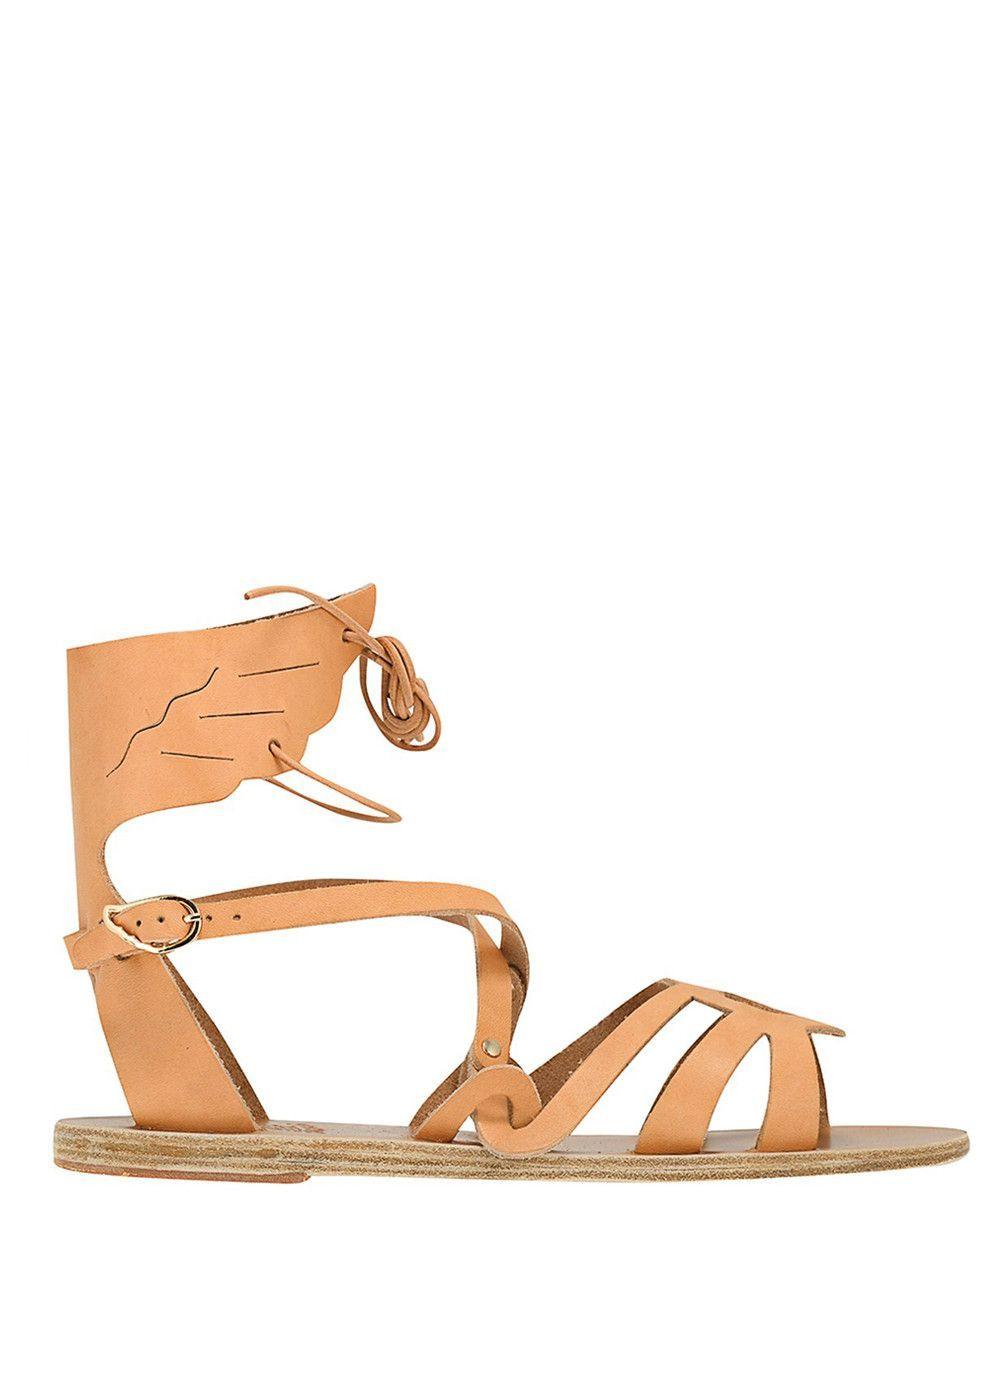 [Ancient Greek Sandals] Elpida Flat Sandal - Natural | Ancient greek sandals  and Products